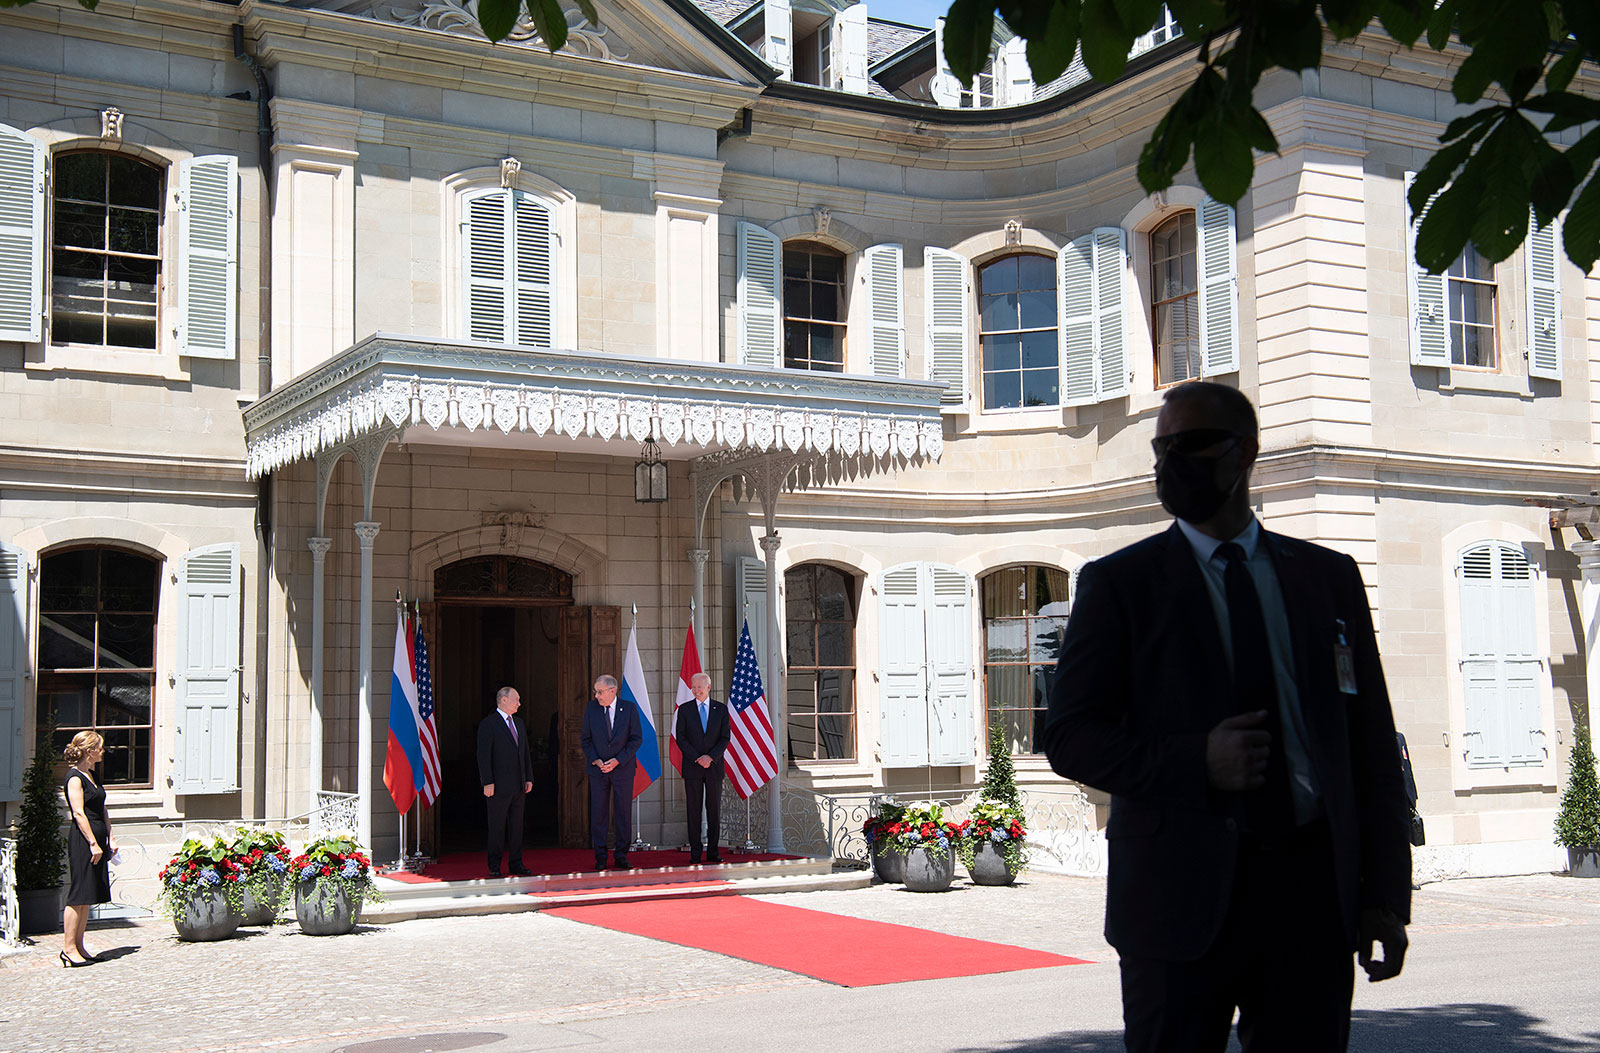 Swiss President Guy Parmelin greets US President Joe Biden and Russian President Vladimir Putin at the Villa la Grange in Geneva on Wednesday.